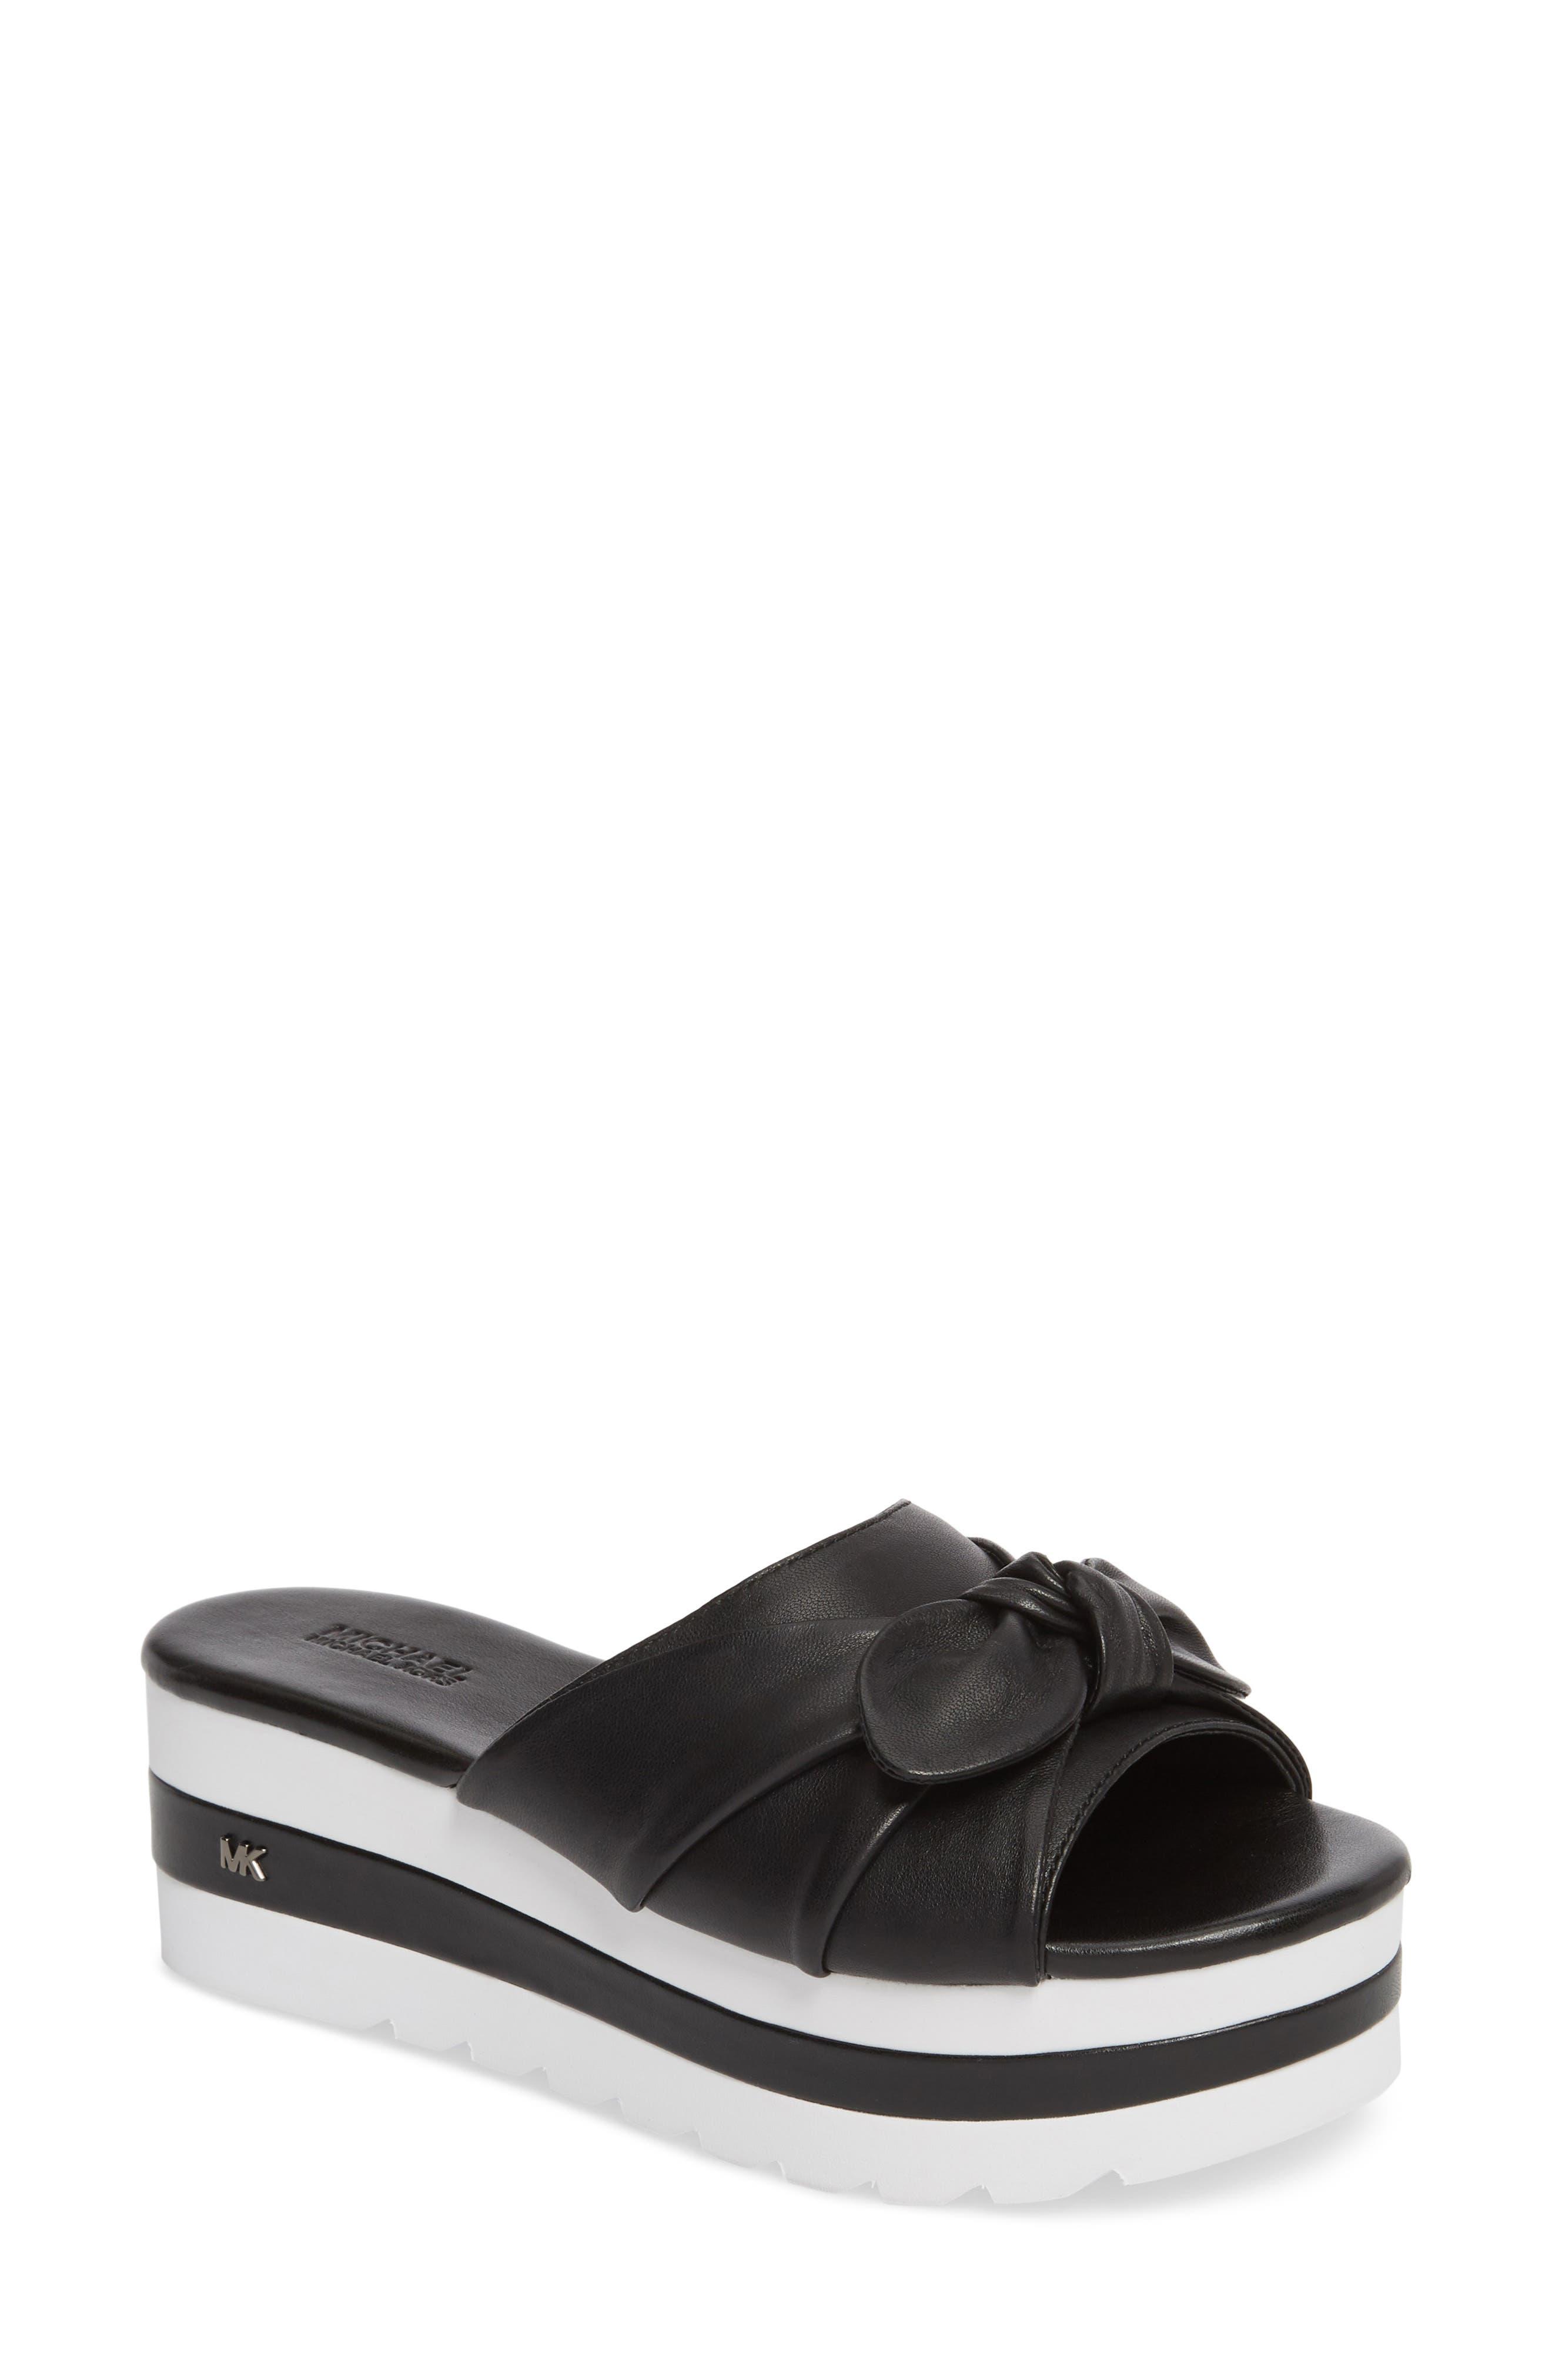 Pippa Platform Slide Sandal,                             Main thumbnail 1, color,                             001